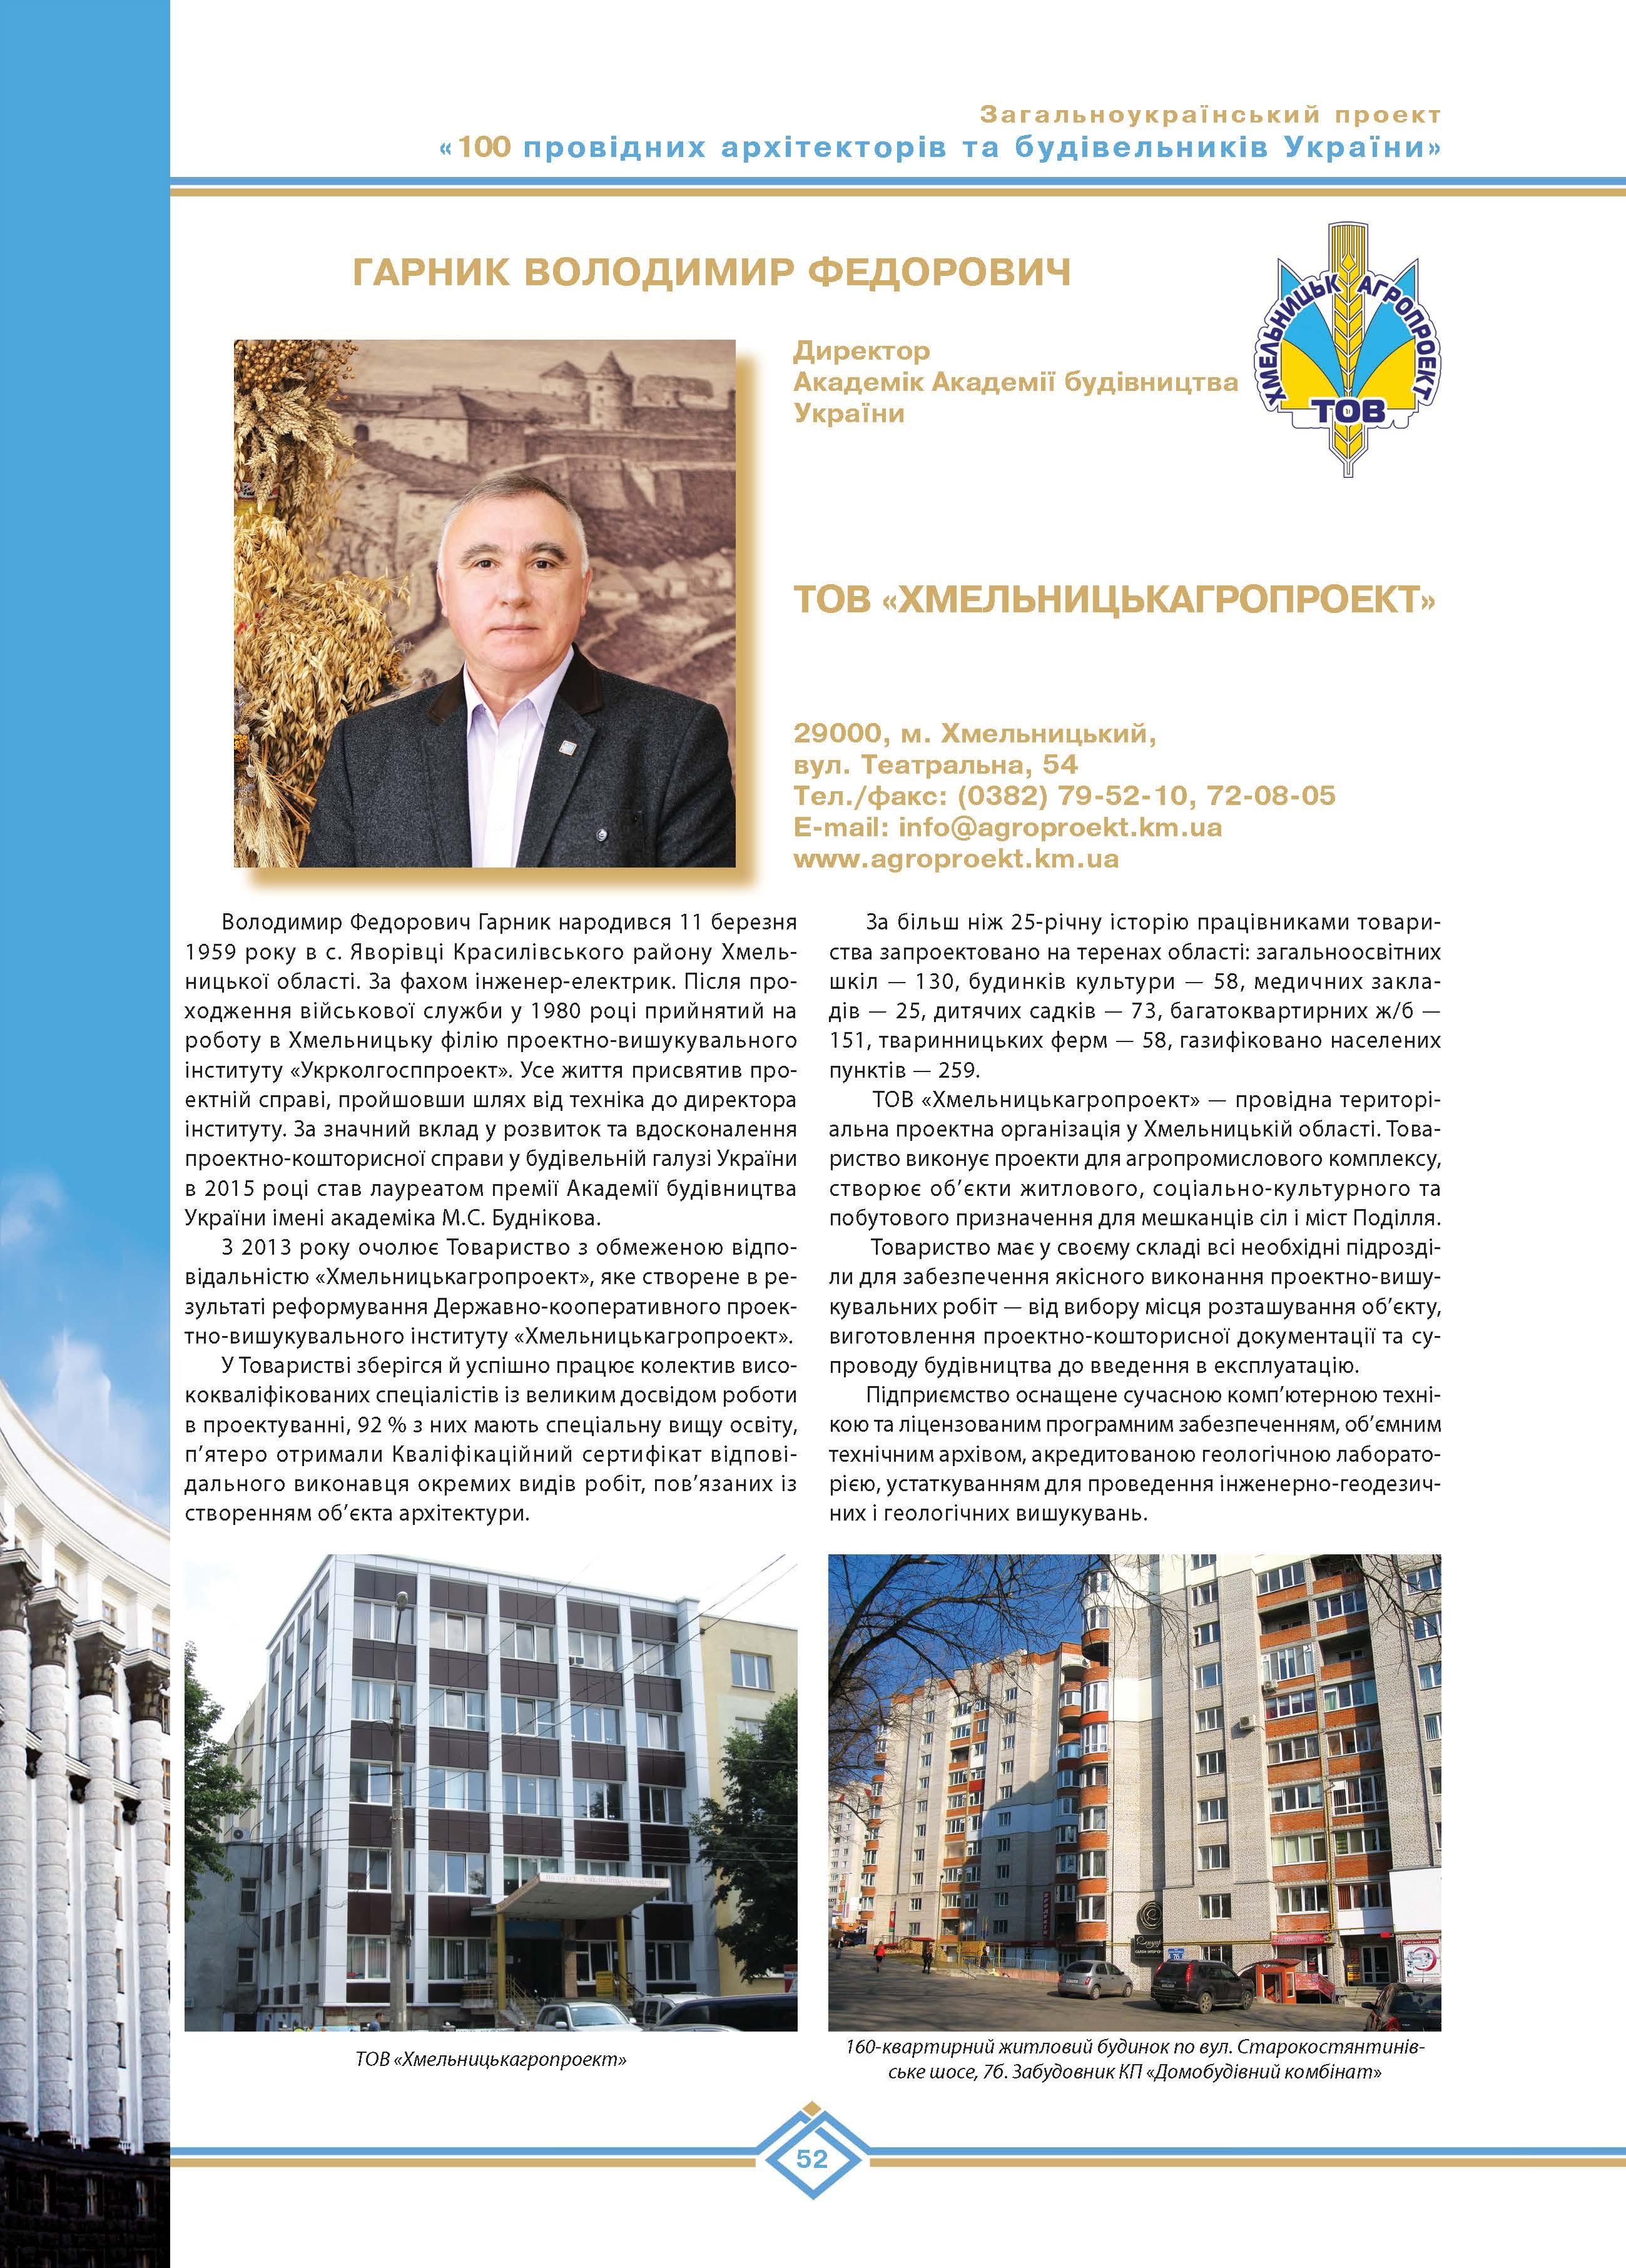 Гарник Володимир Федорович